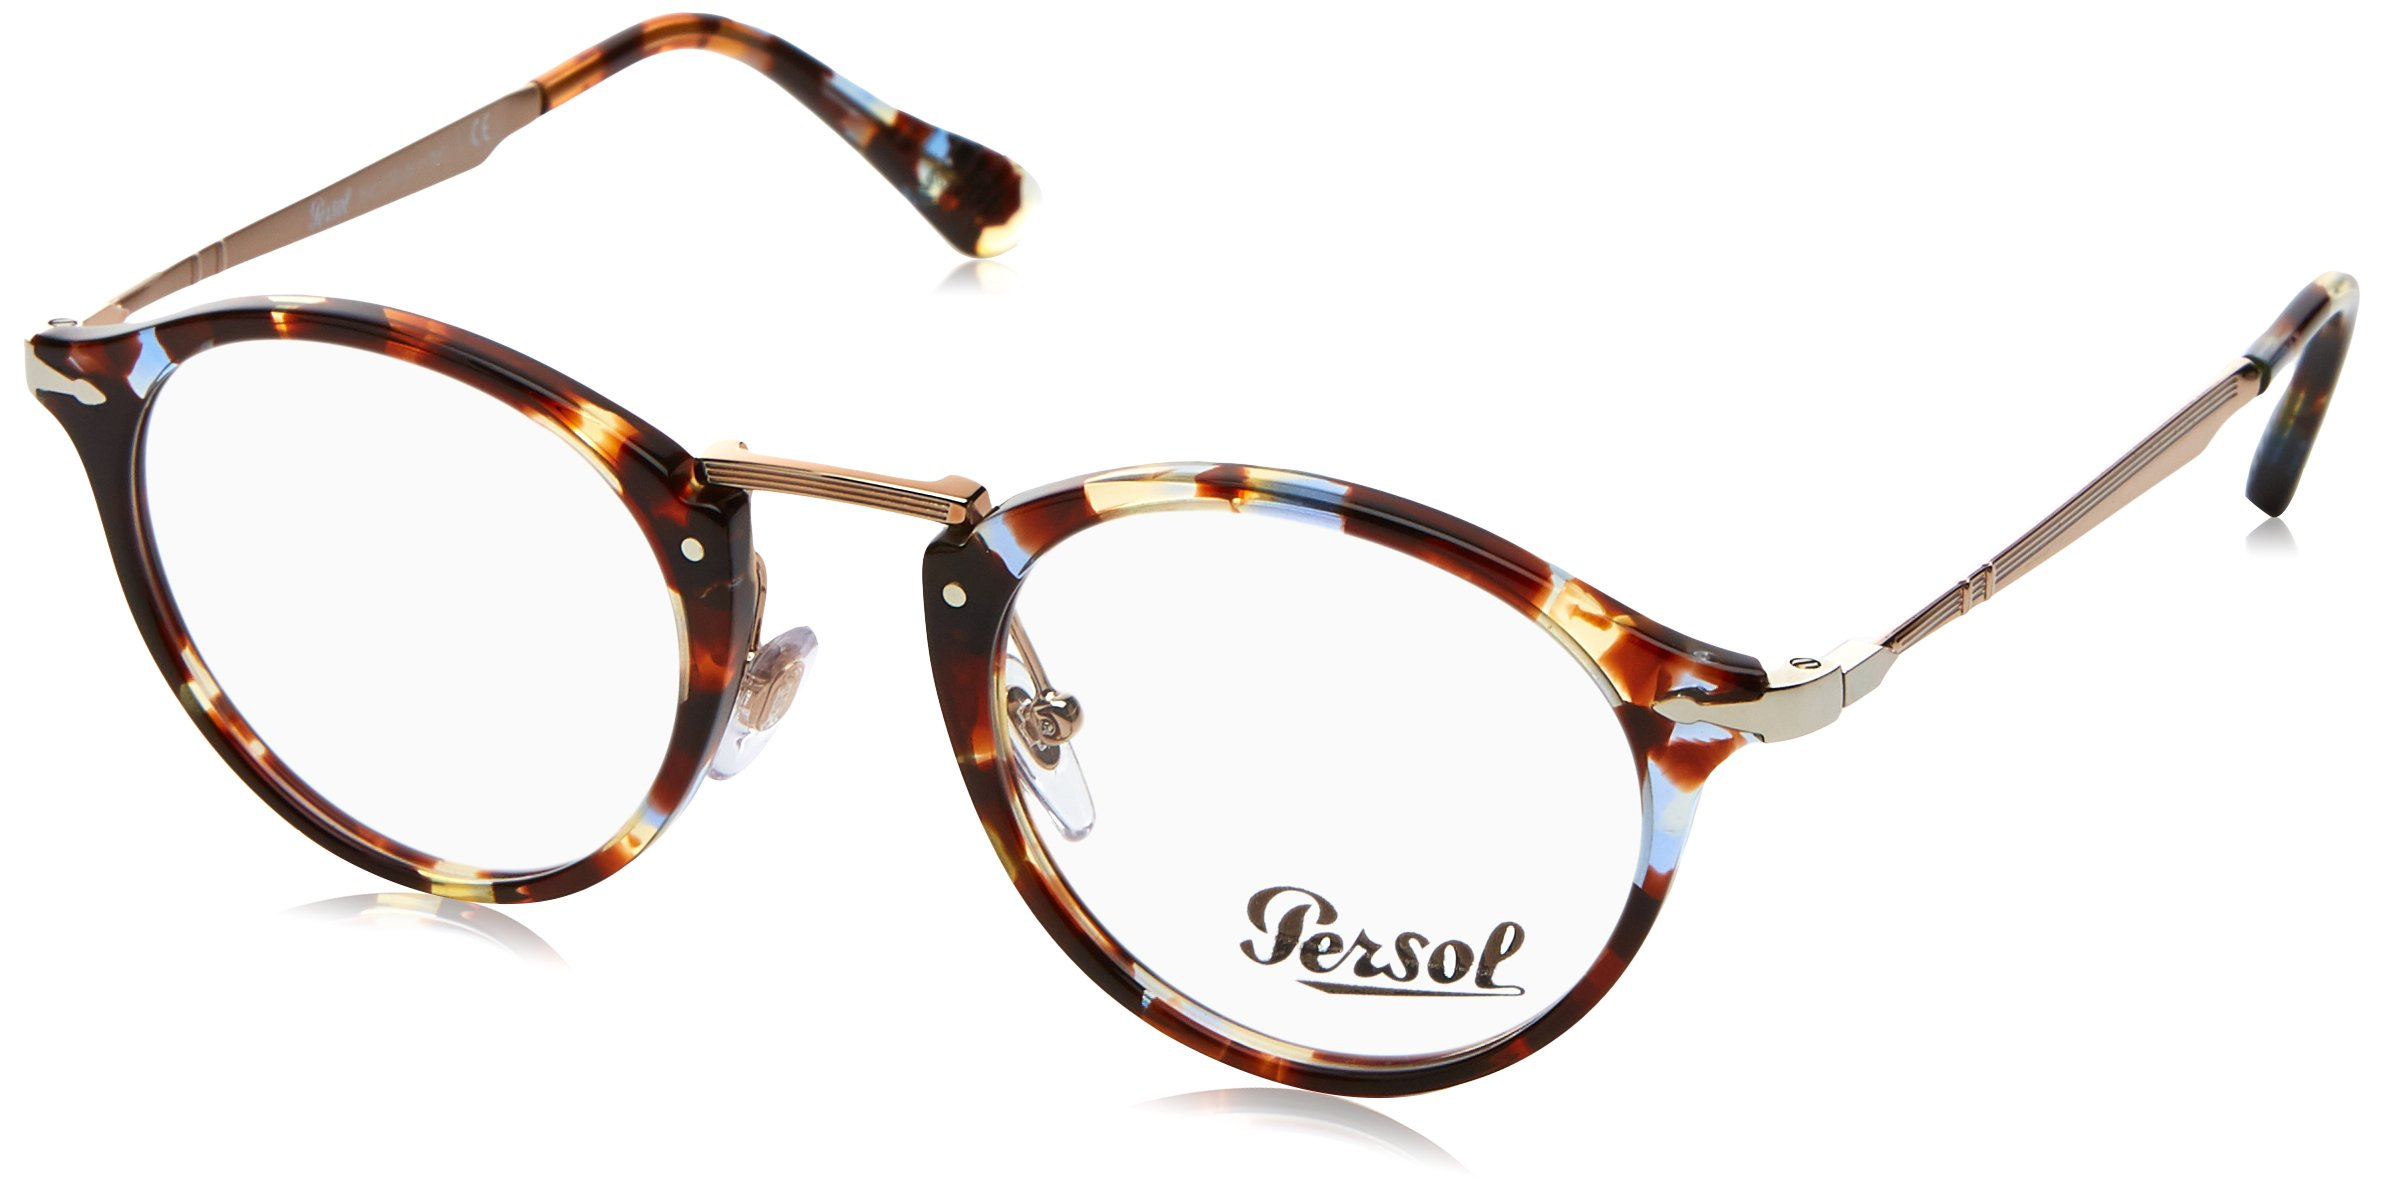 ویکالا · خرید  اصل اورجینال · خرید از آمازون · Persol PO3167V Eyeglasses 1058 Havana Azure Brown w/ Demo Lens 47mm wekala · ویکالا